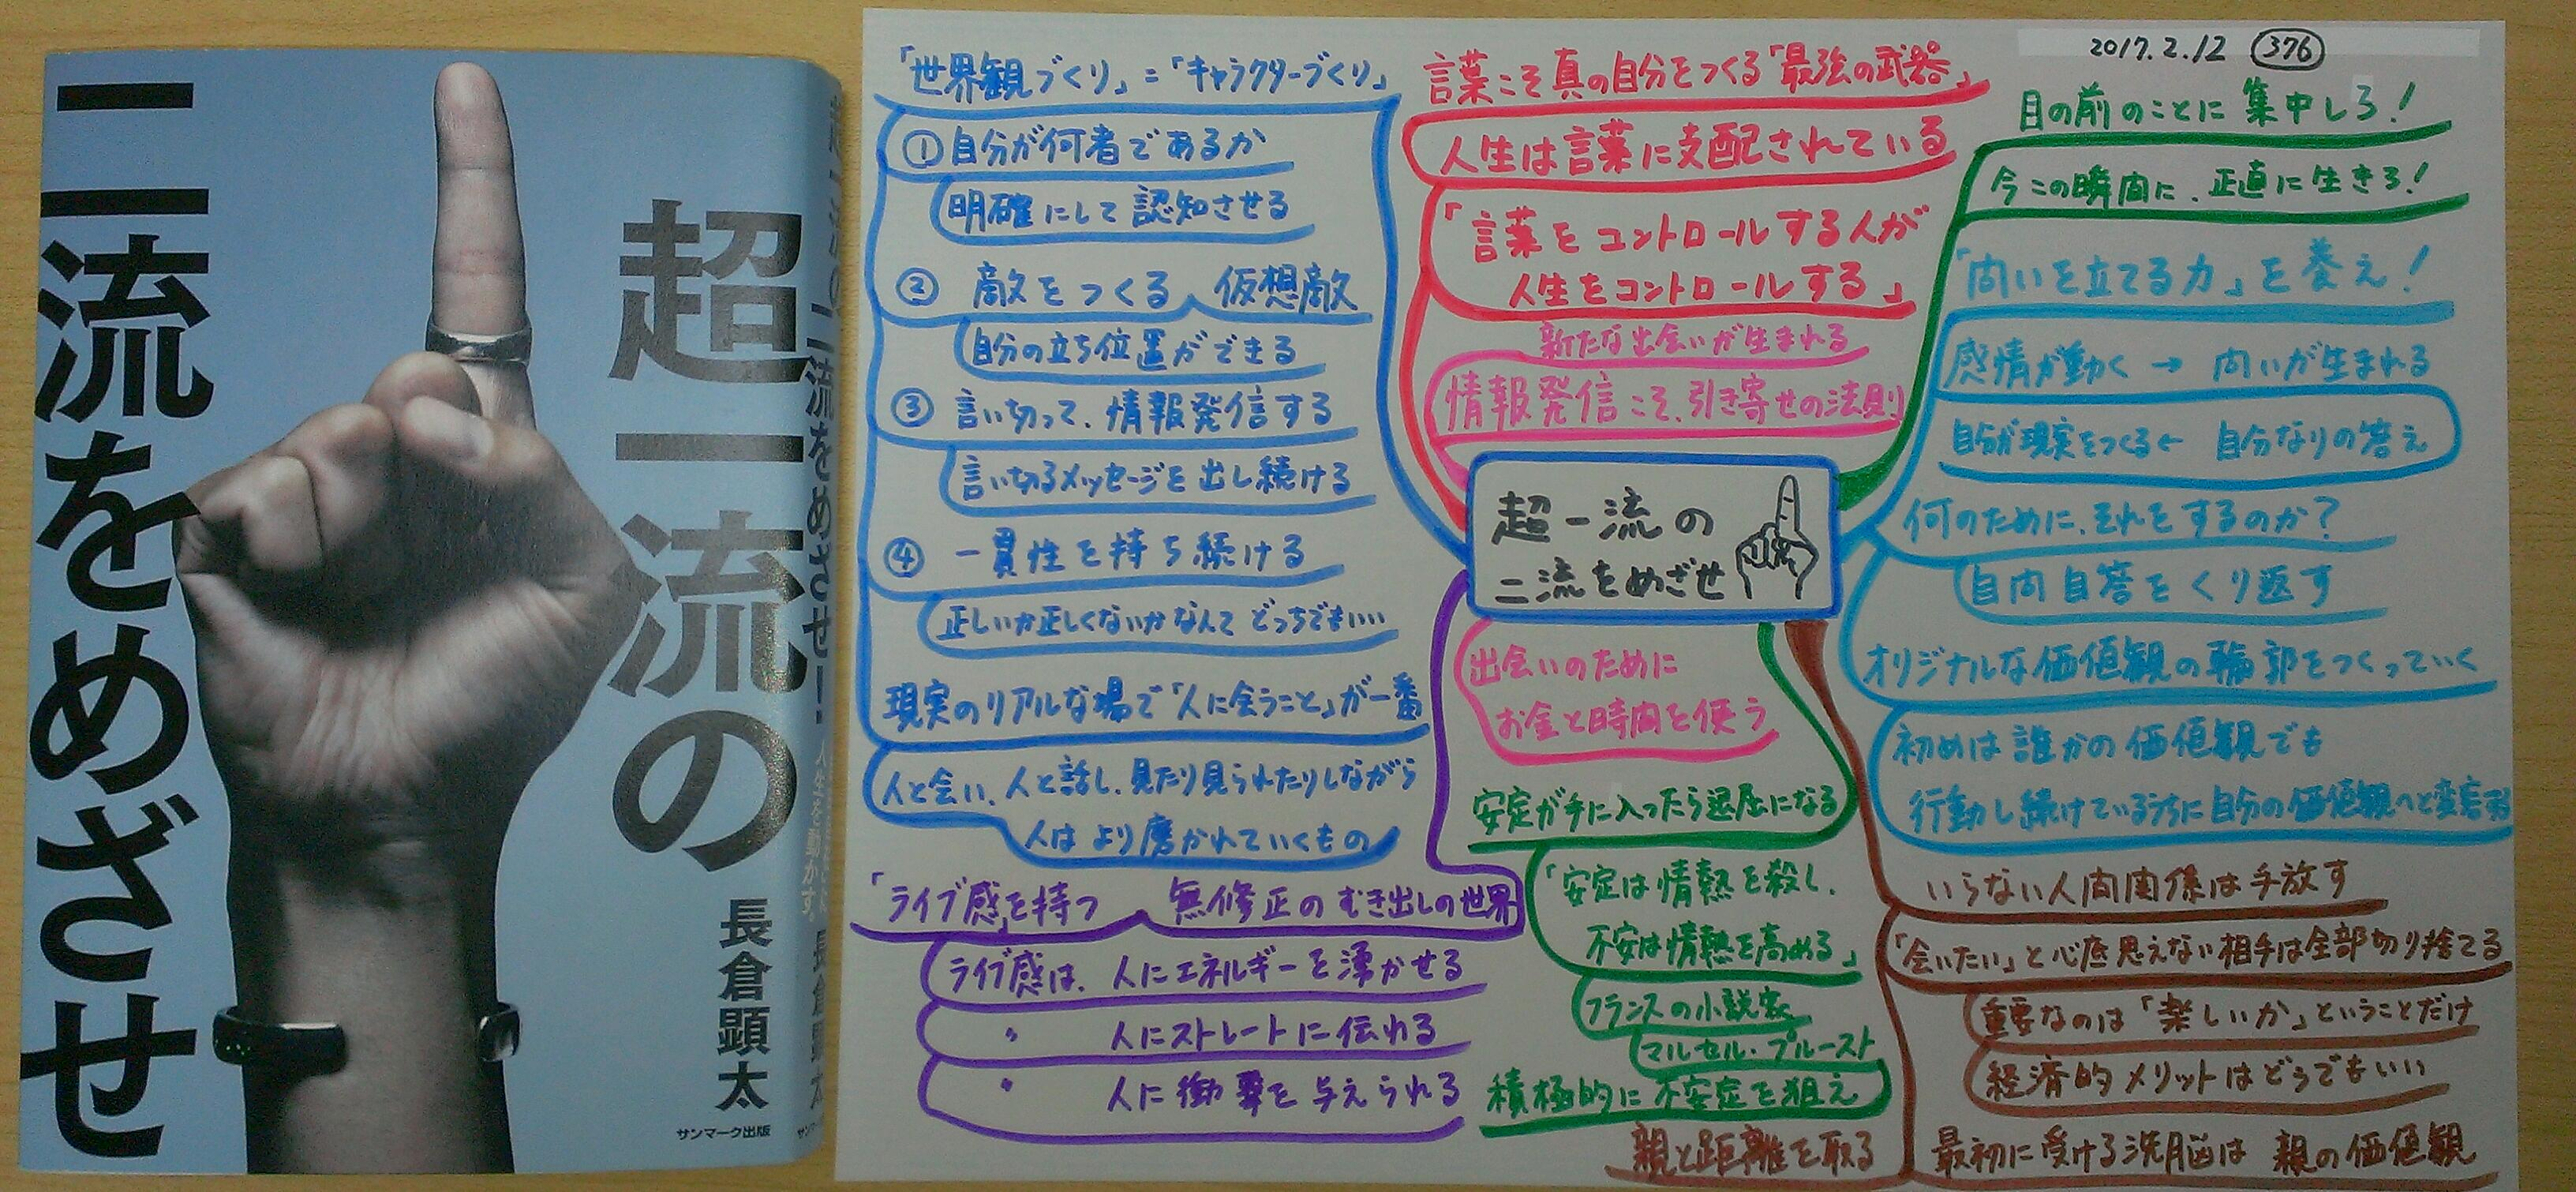 IMAG2742_1